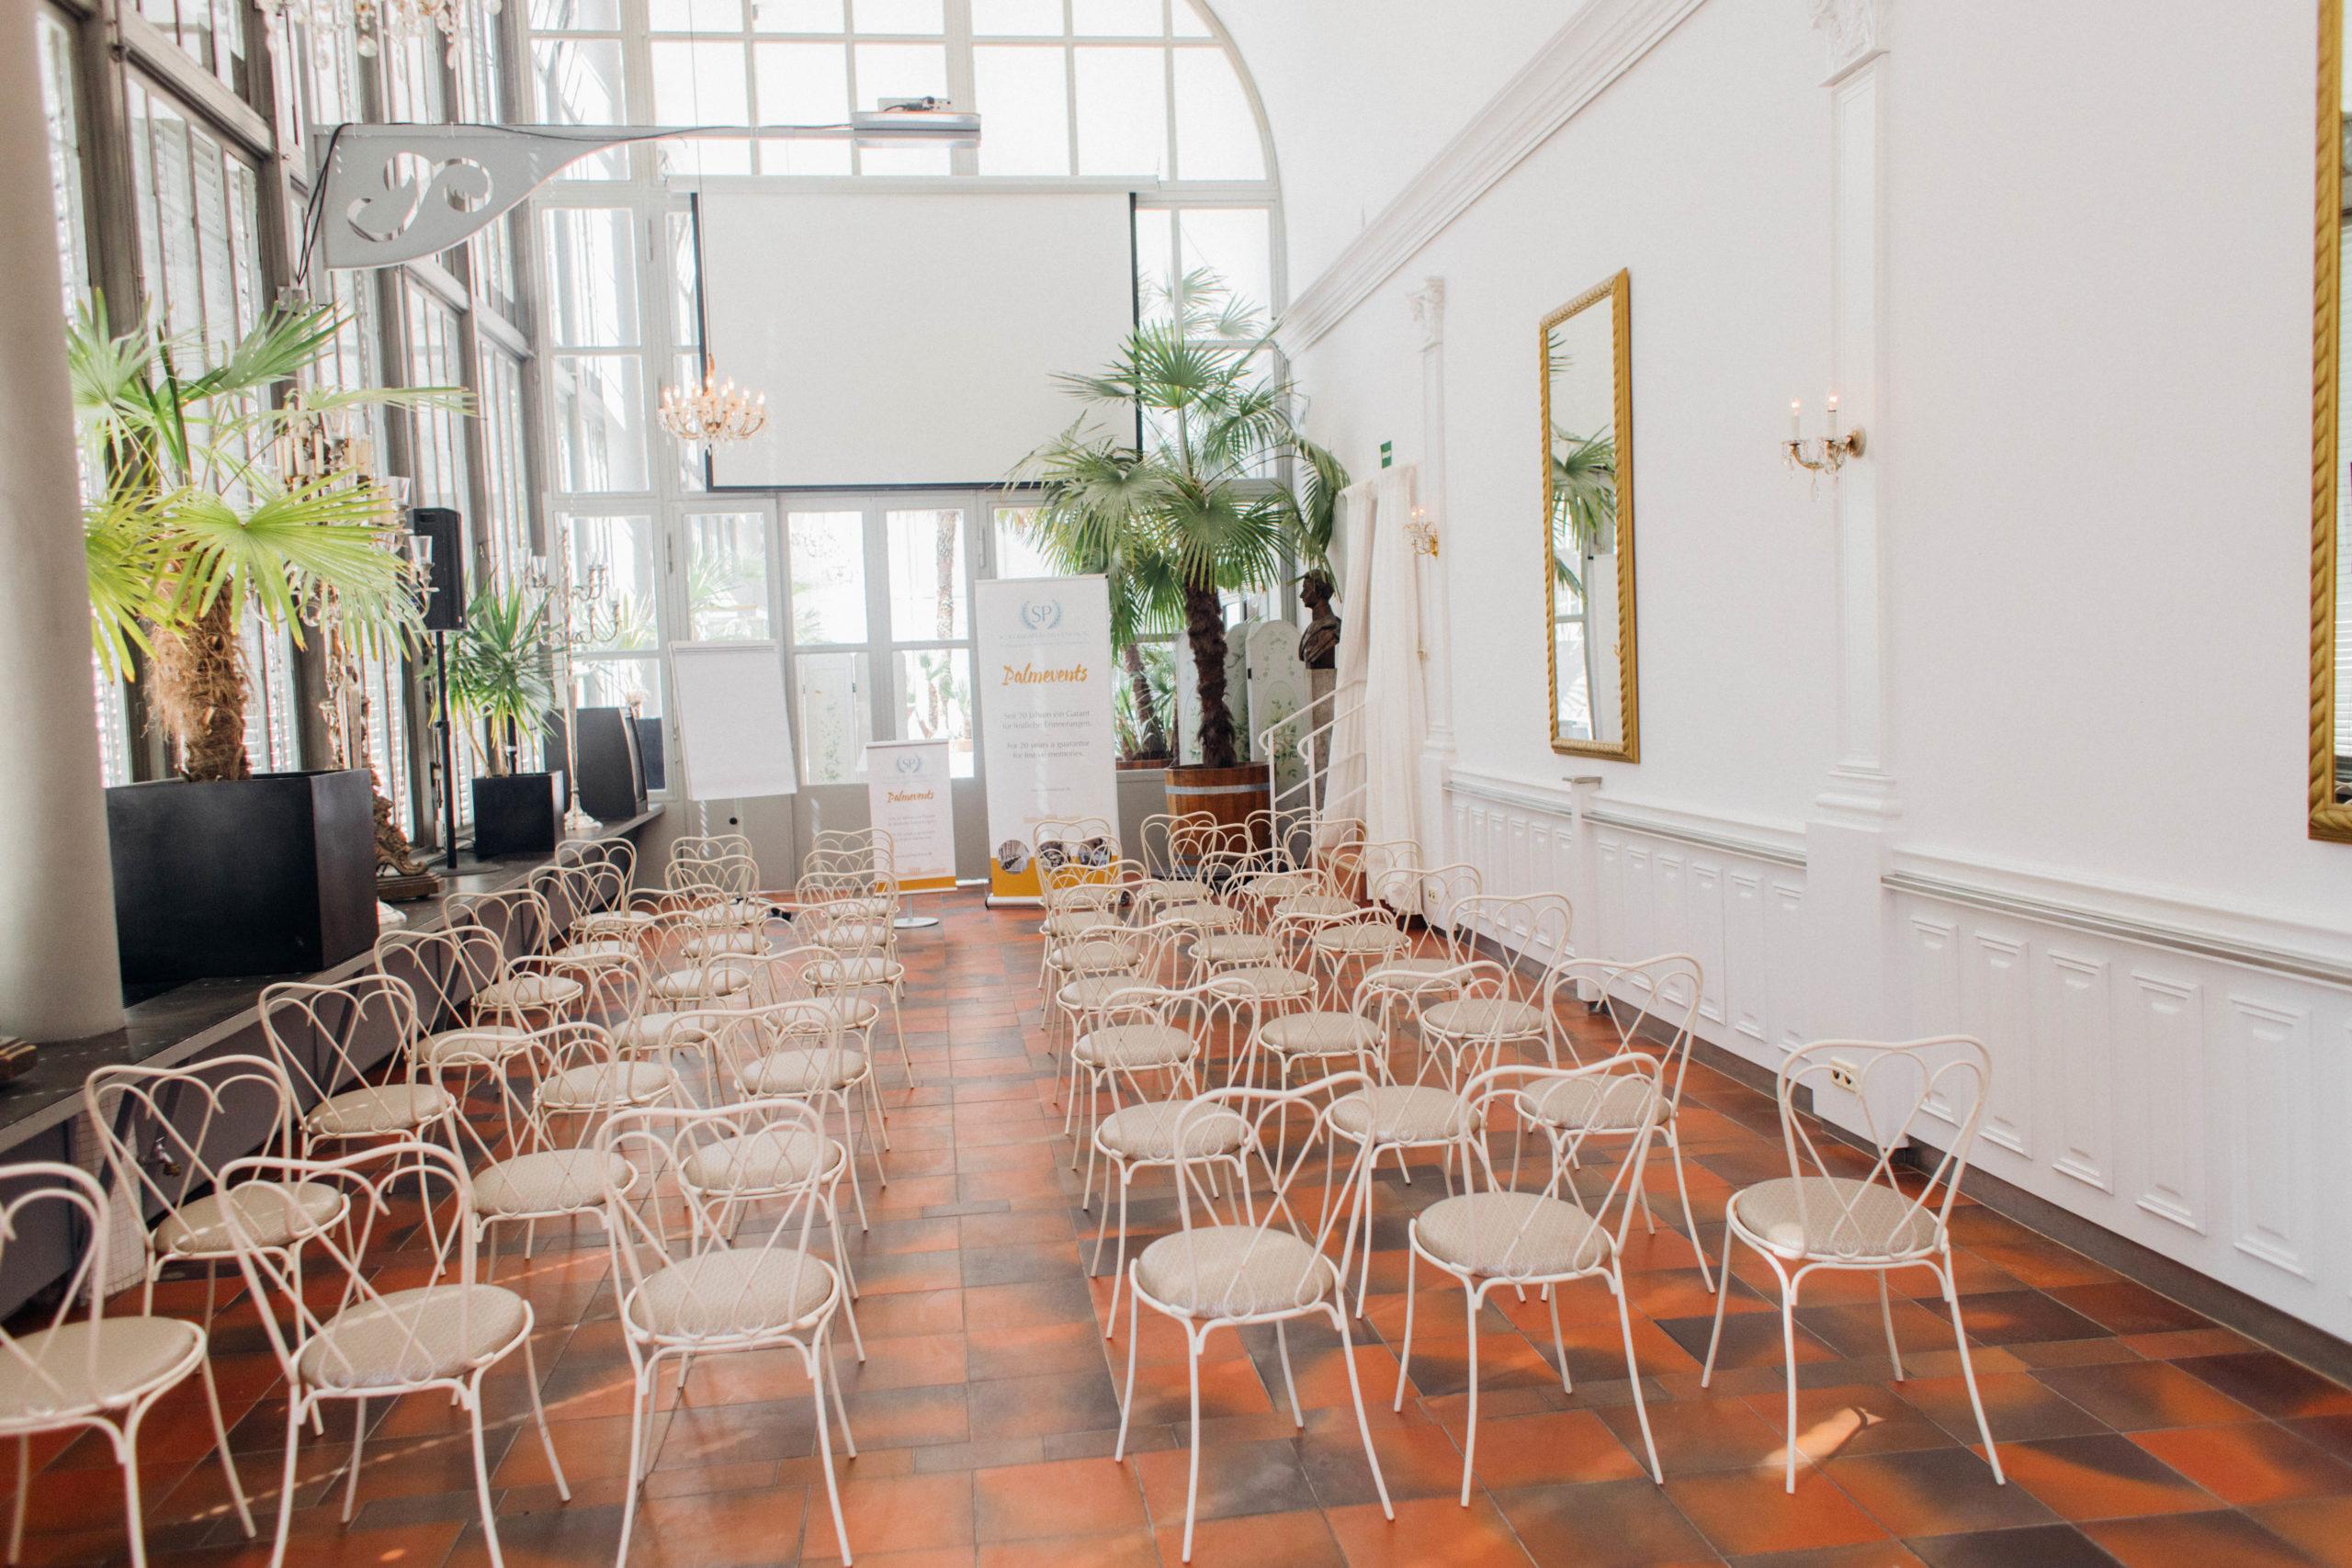 Schlosscafé im Palmenhaus, Tagung